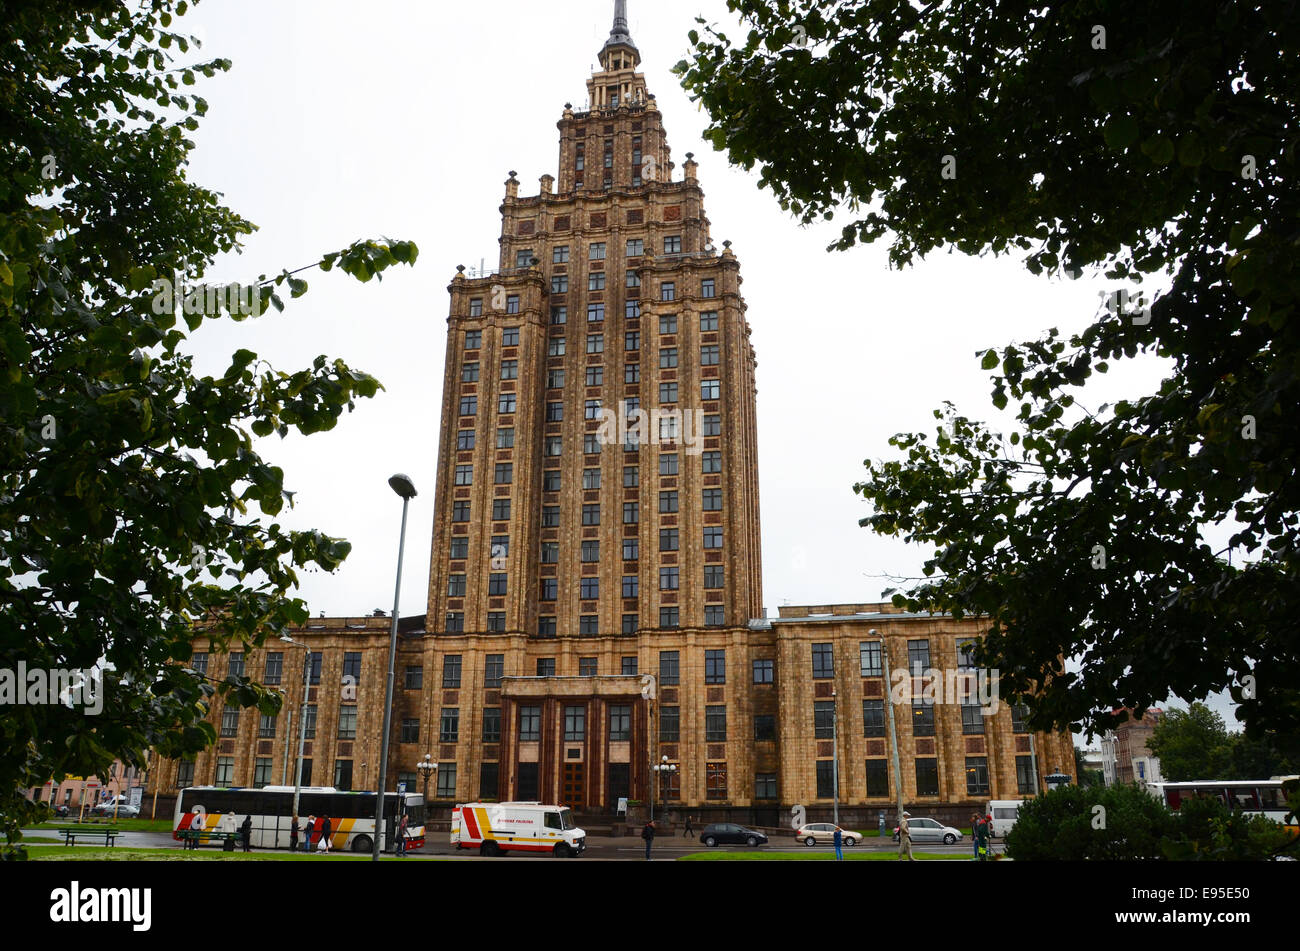 latvian academy of science riga soviet stalinist building socialist classicism - Stock Image